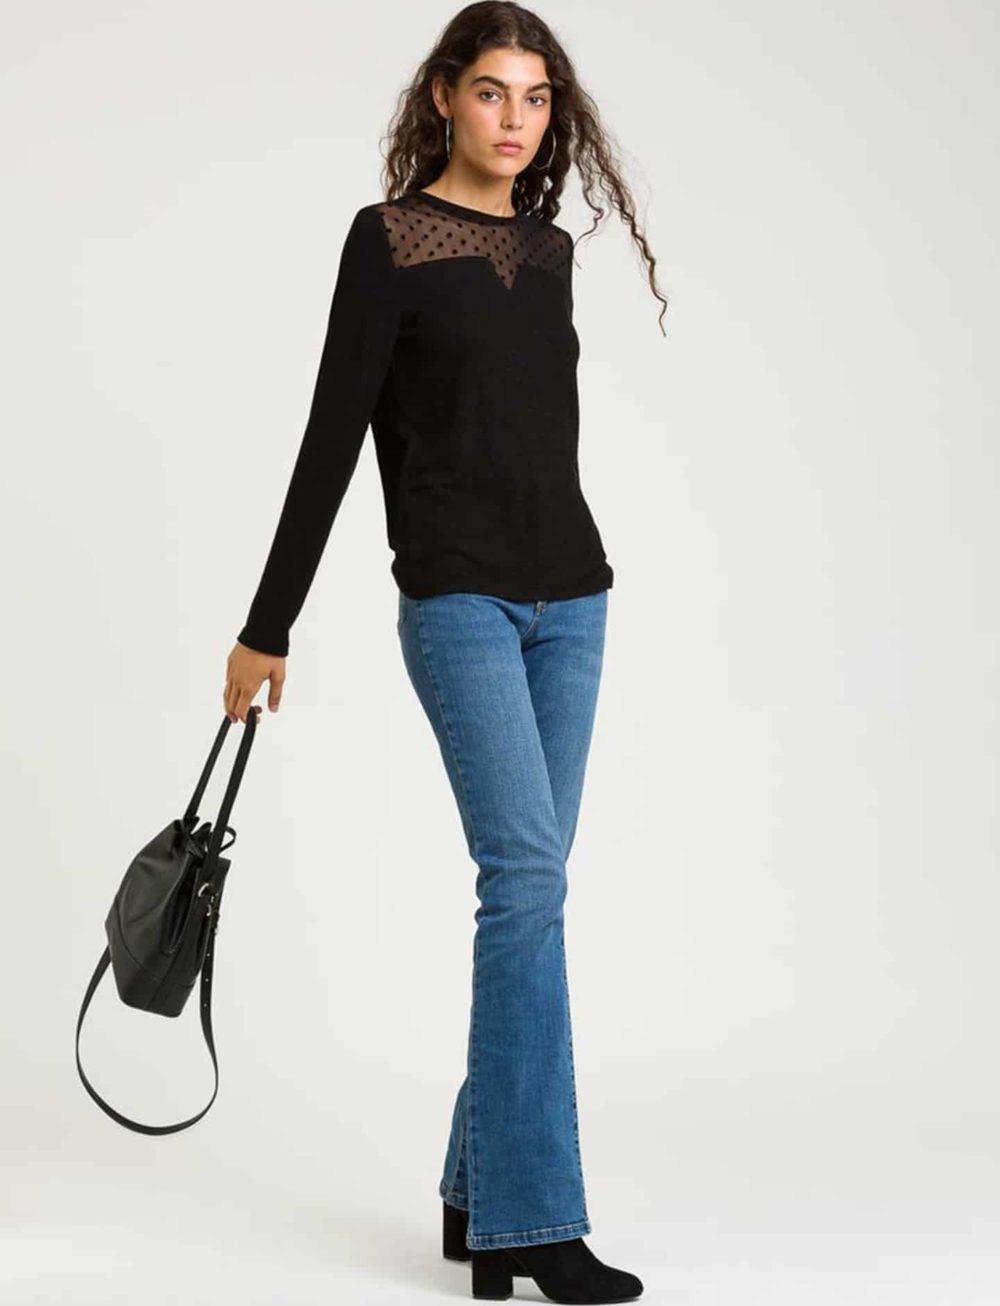 camiseta-combinada-transparencias-negra-general